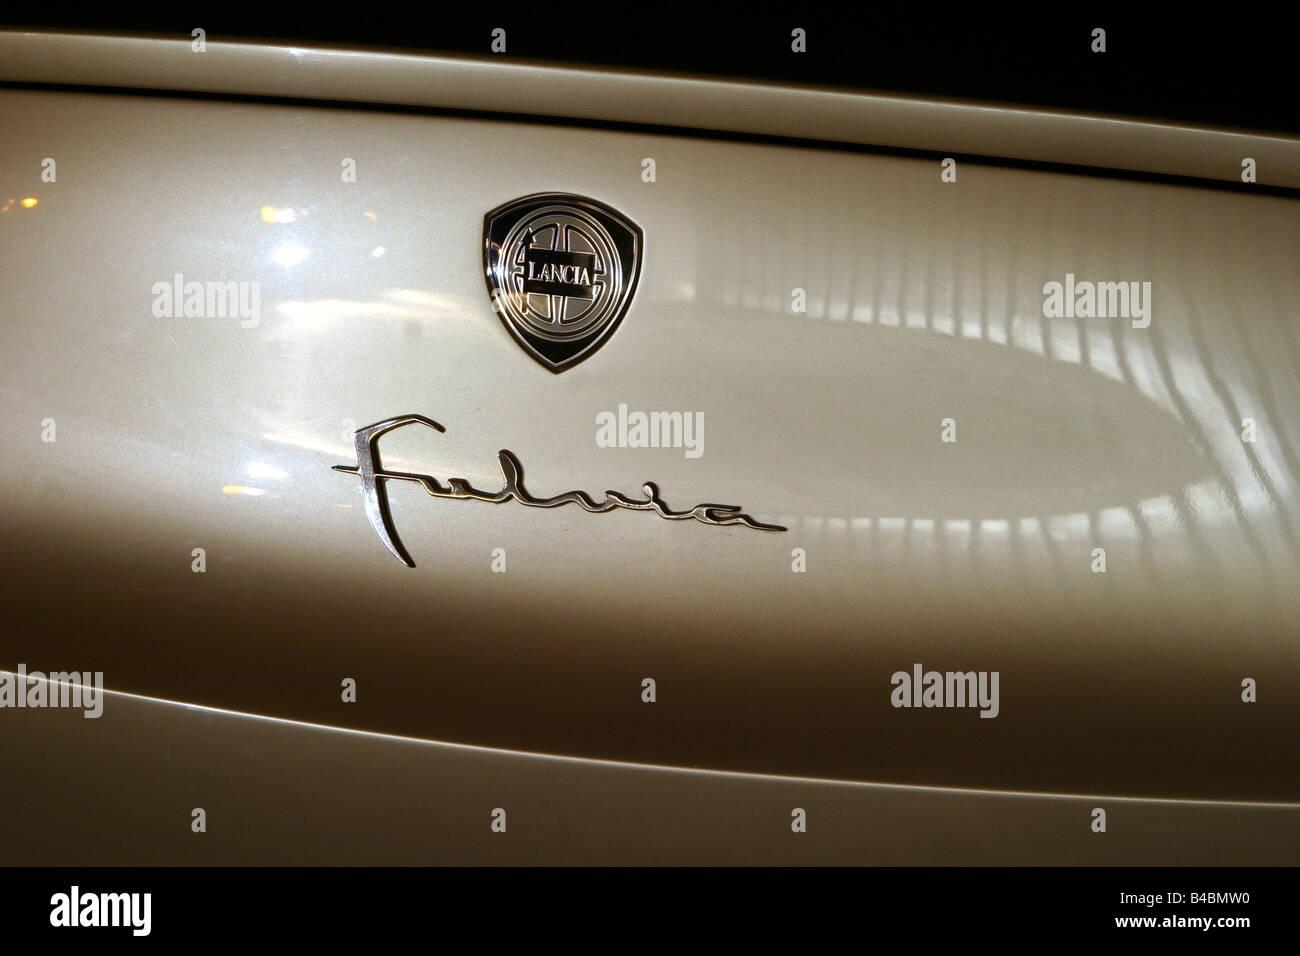 Car, Lancia Fulvia, Study, Draft and design study, model year 2003, silver, Detailed view, Company logo, Model designation - Stock Image